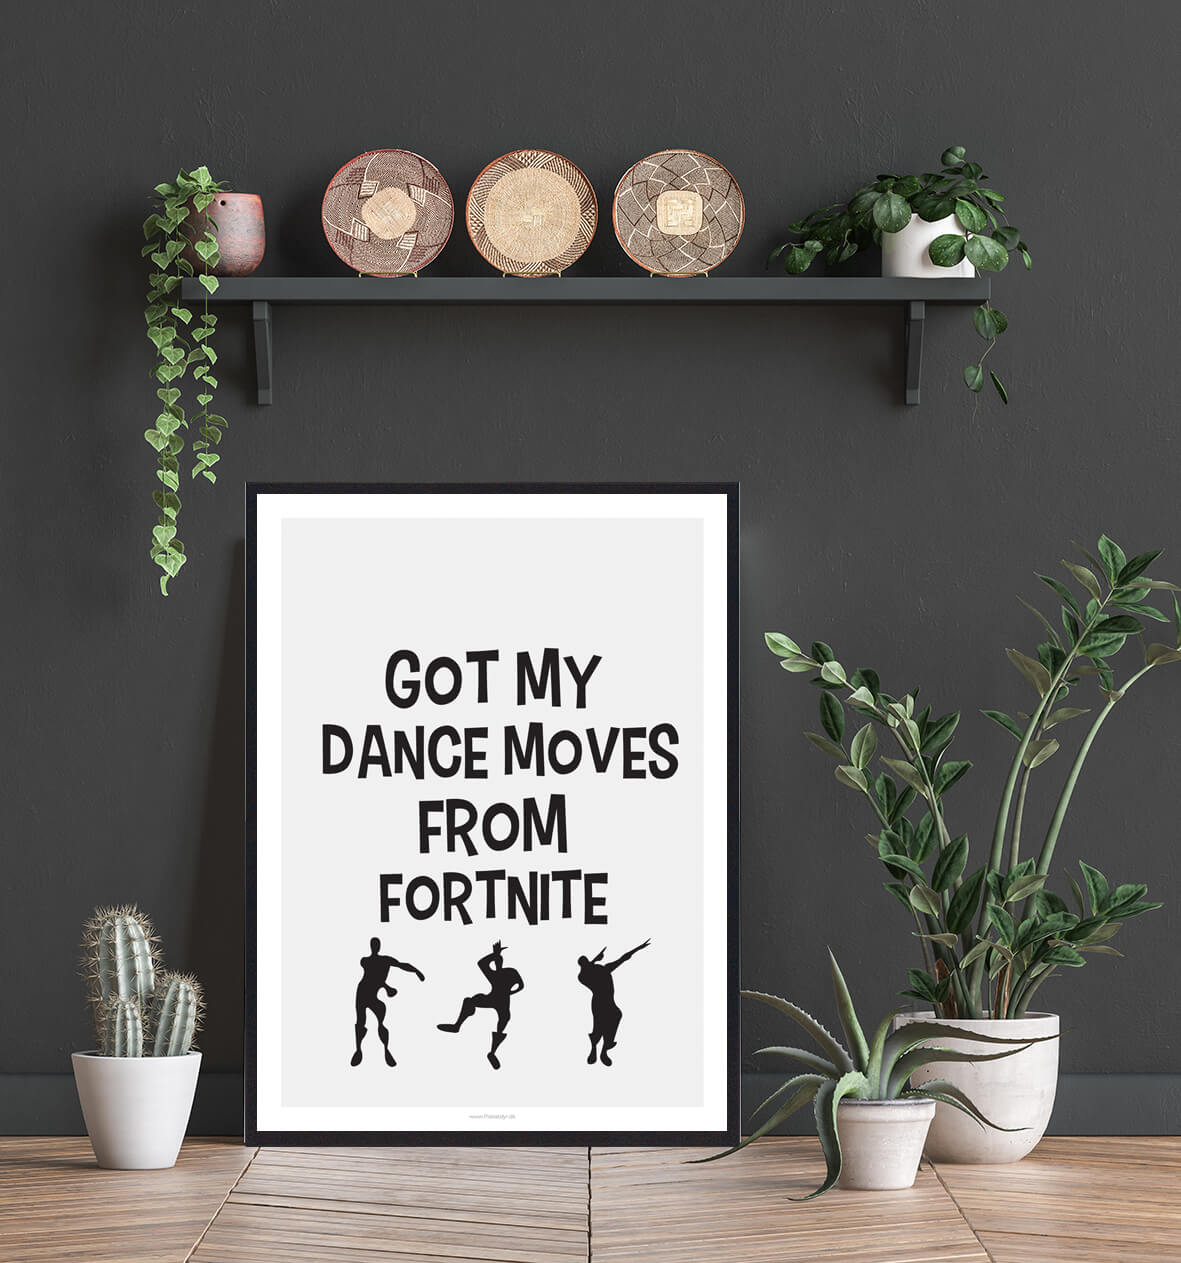 Fortnite-dances-moves-1